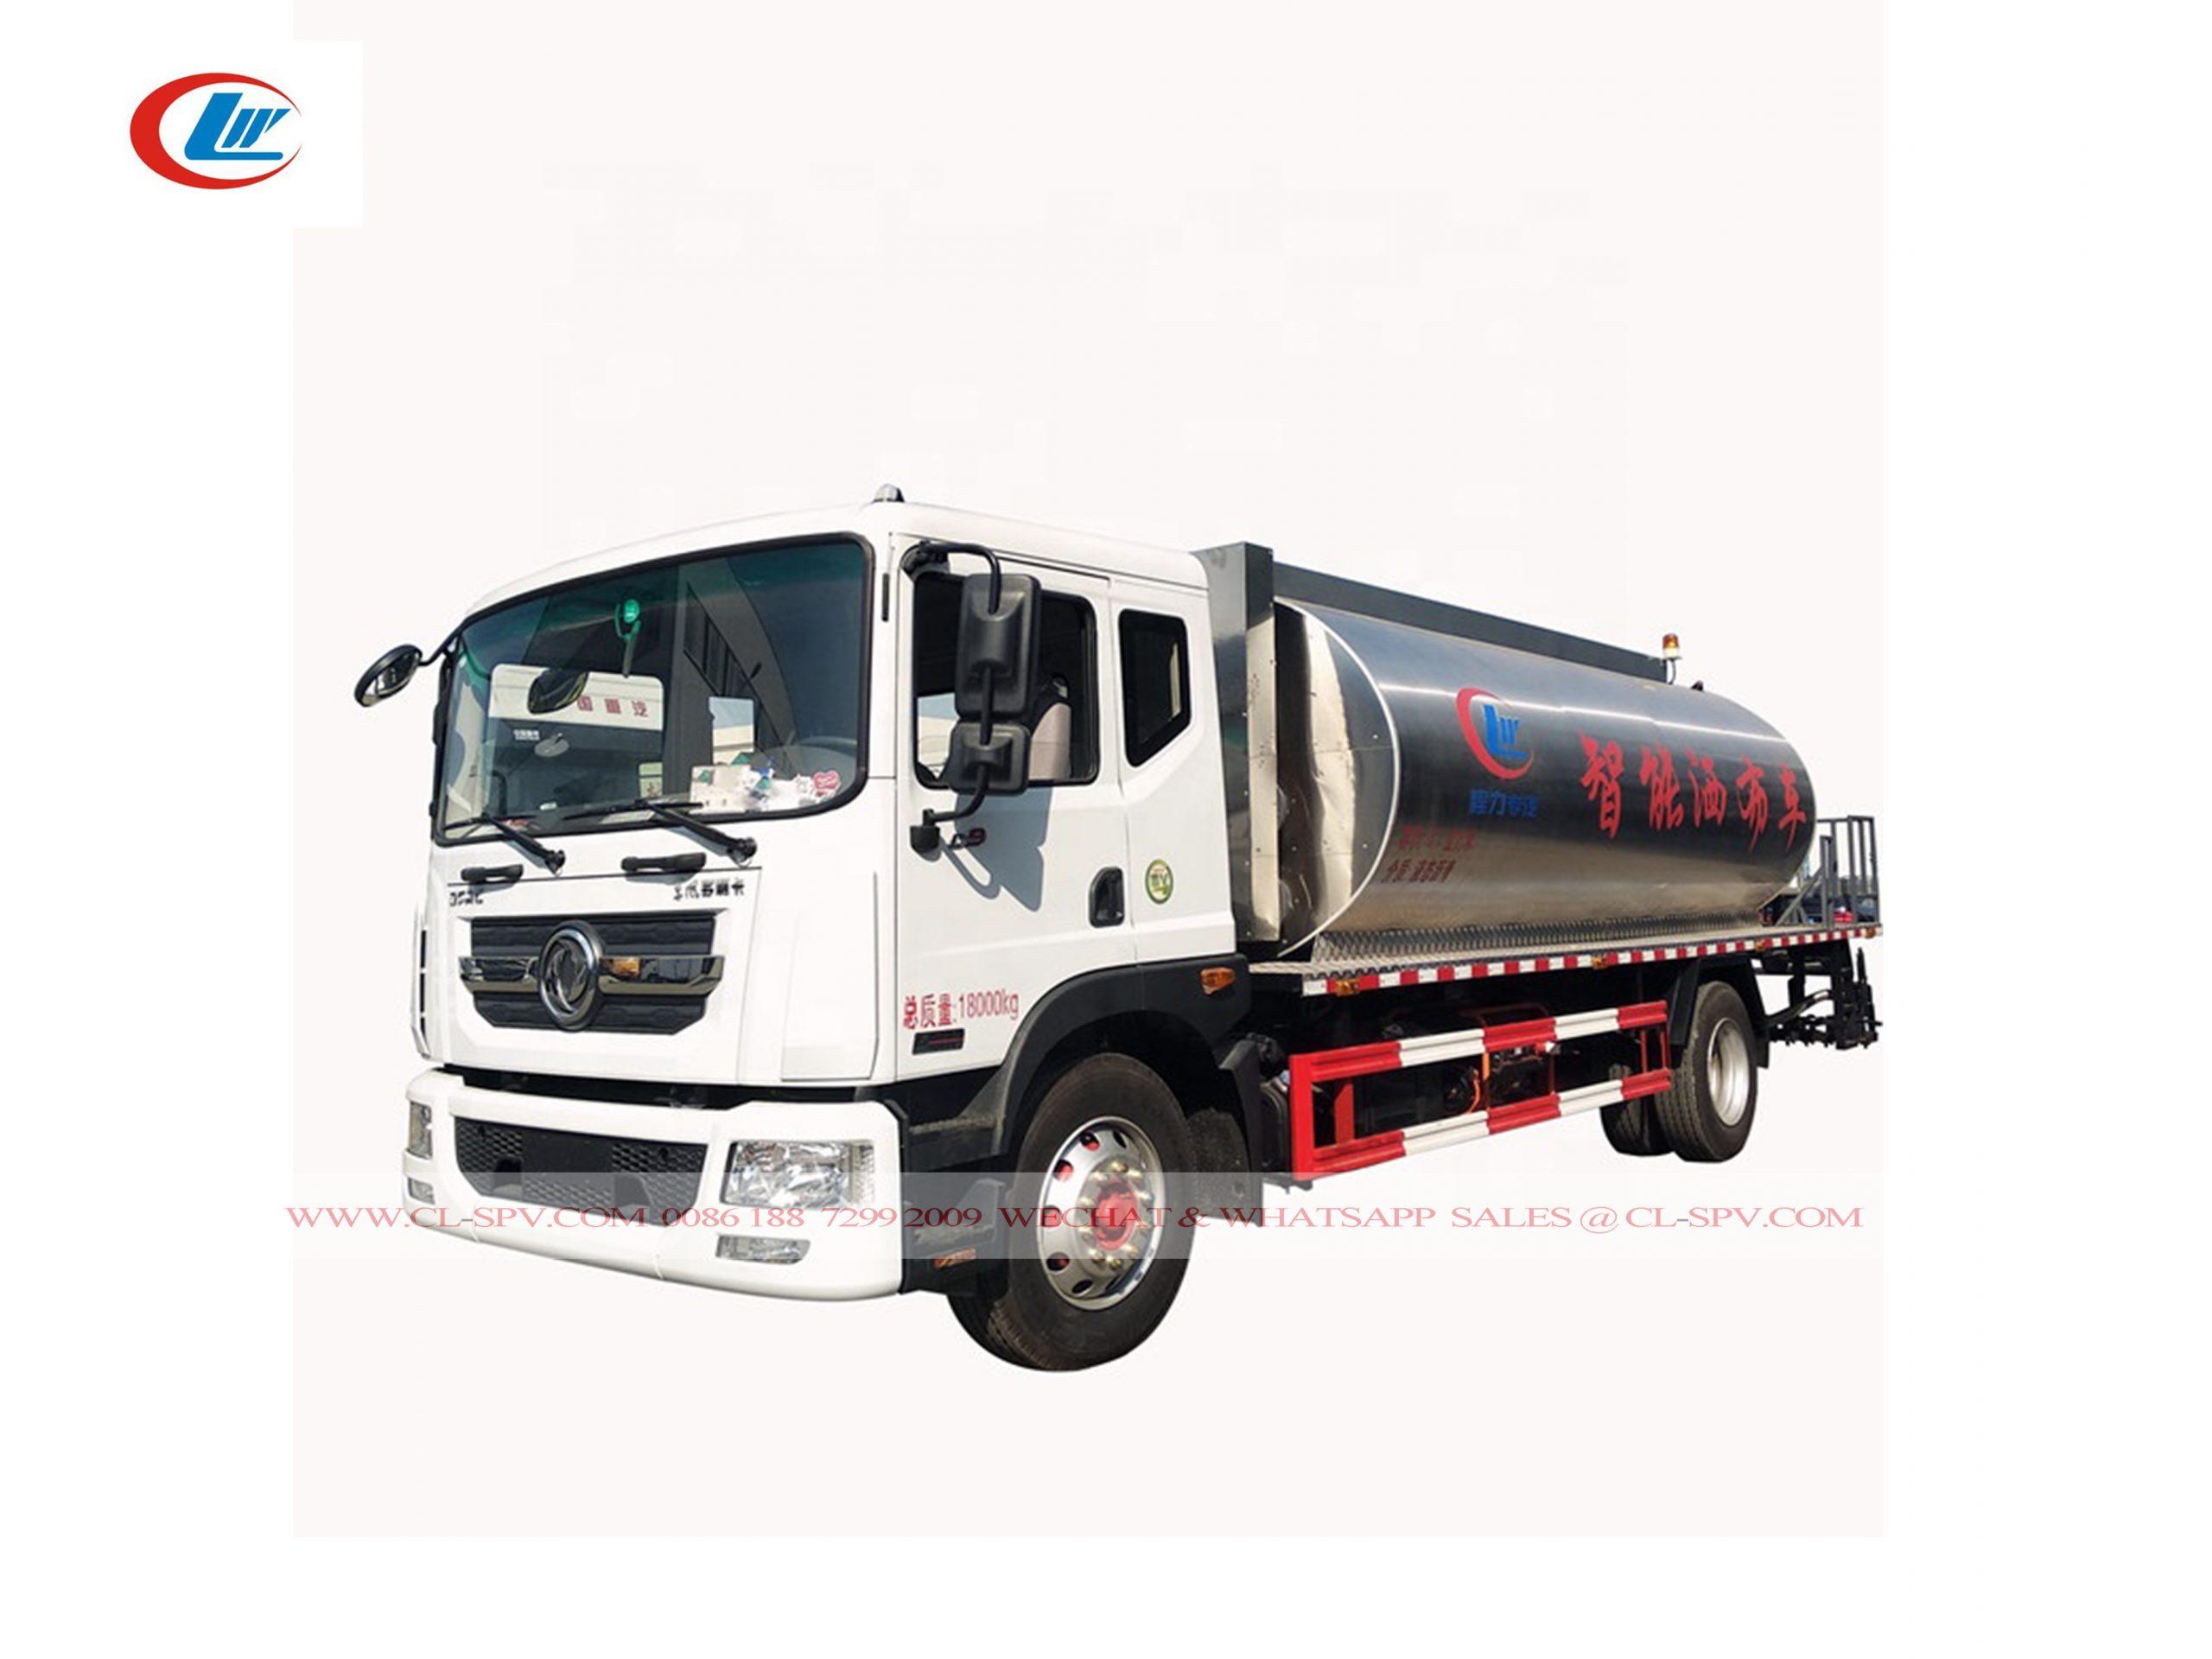 Dongfeng 8000 litros Camión pulverizador de betún